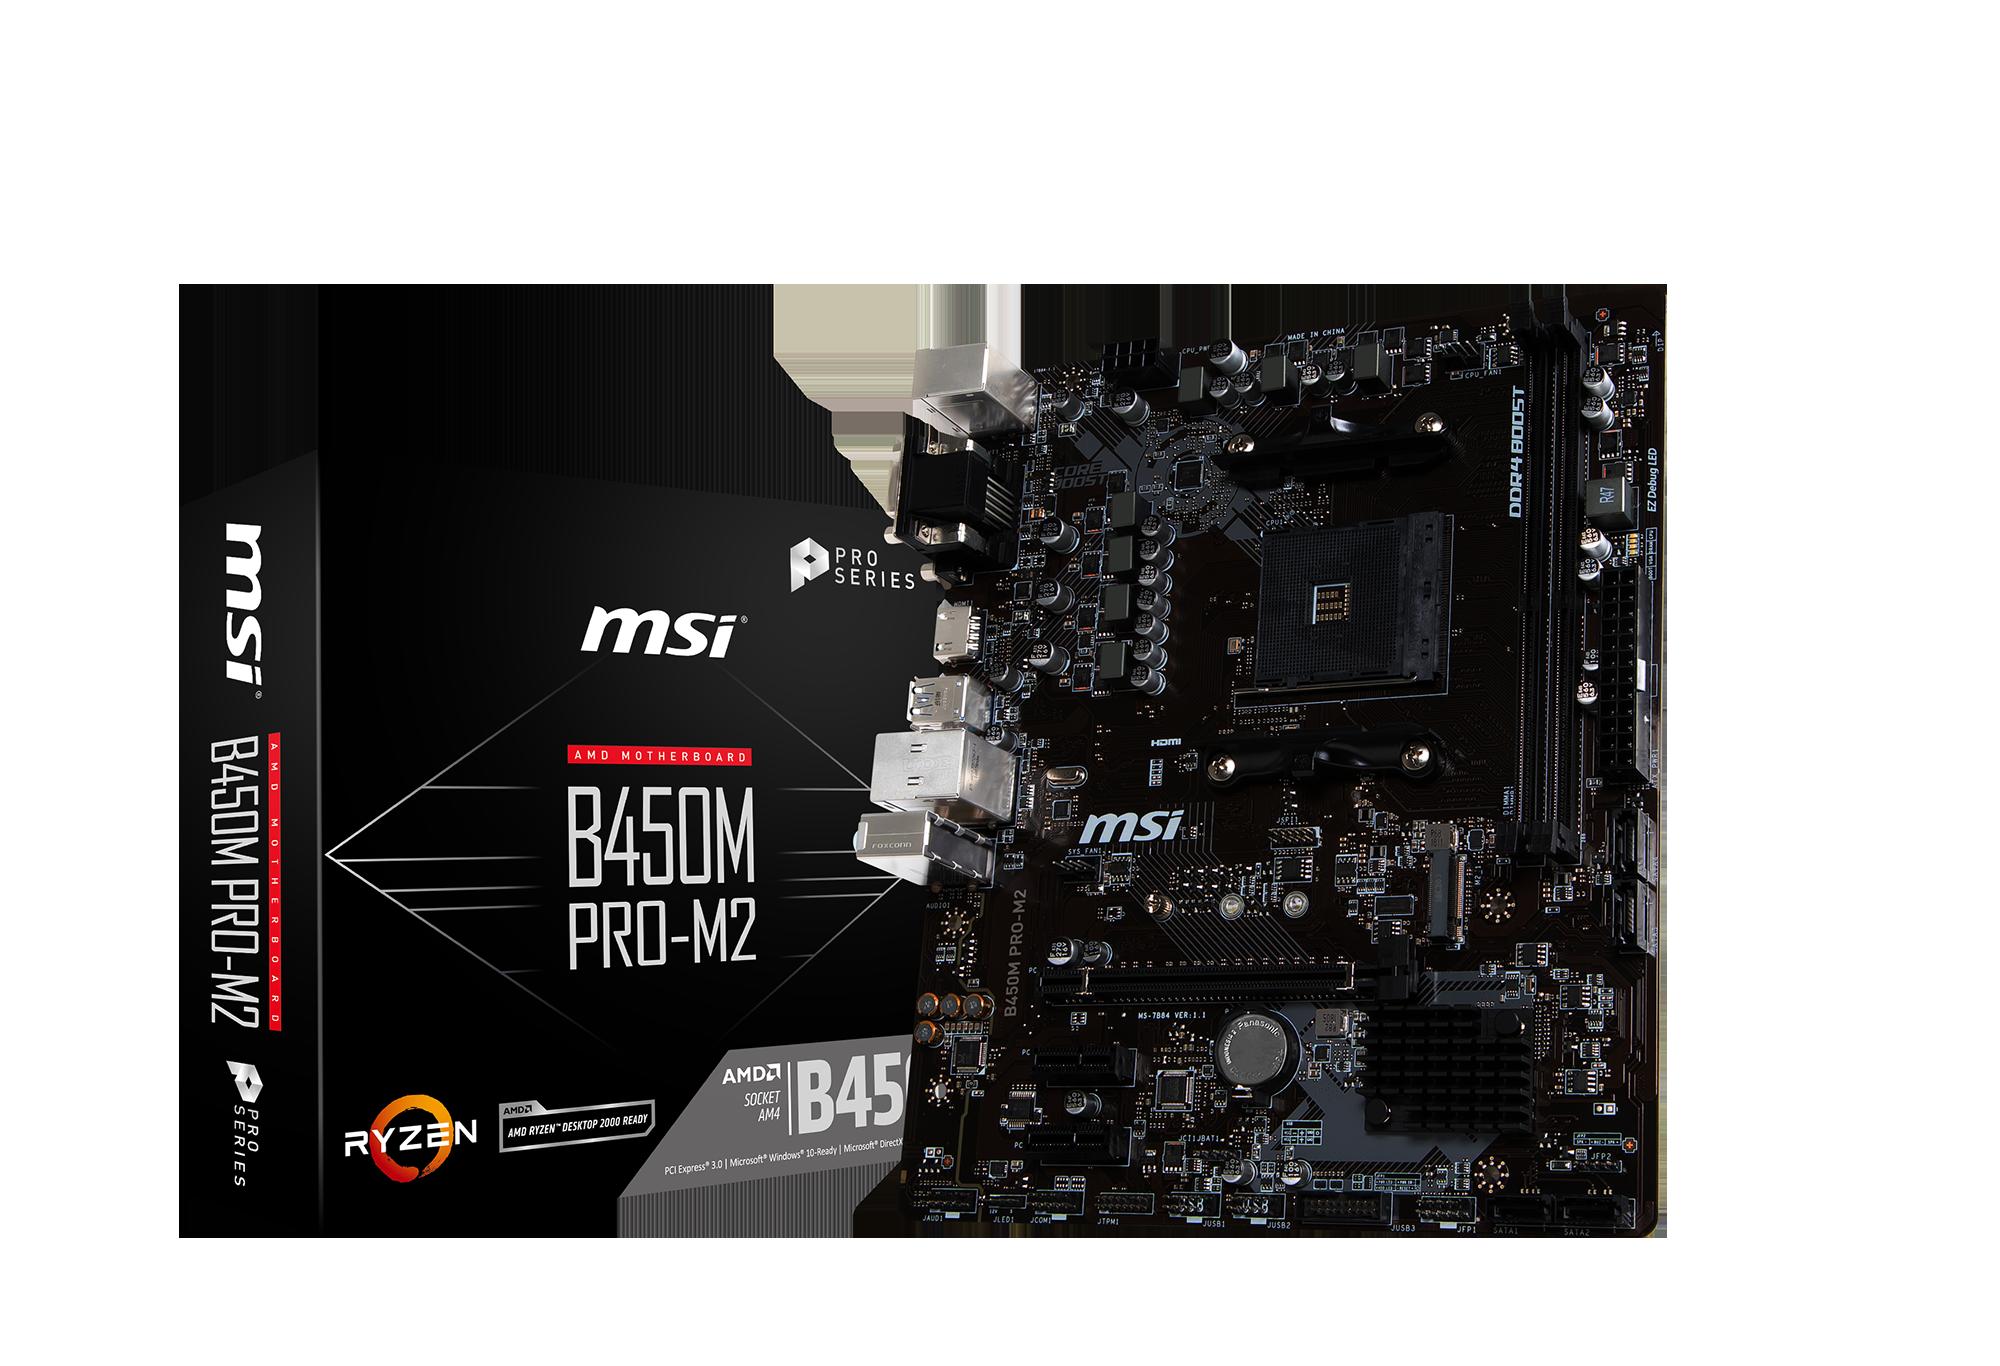 MSI B450M PRO-M2 - Motherboard - micro ATX - Socket AM4 - AMD B450 - USB 3.1 Gen 1 - Gigabit LAN - Onboard-Grafik (CPU e